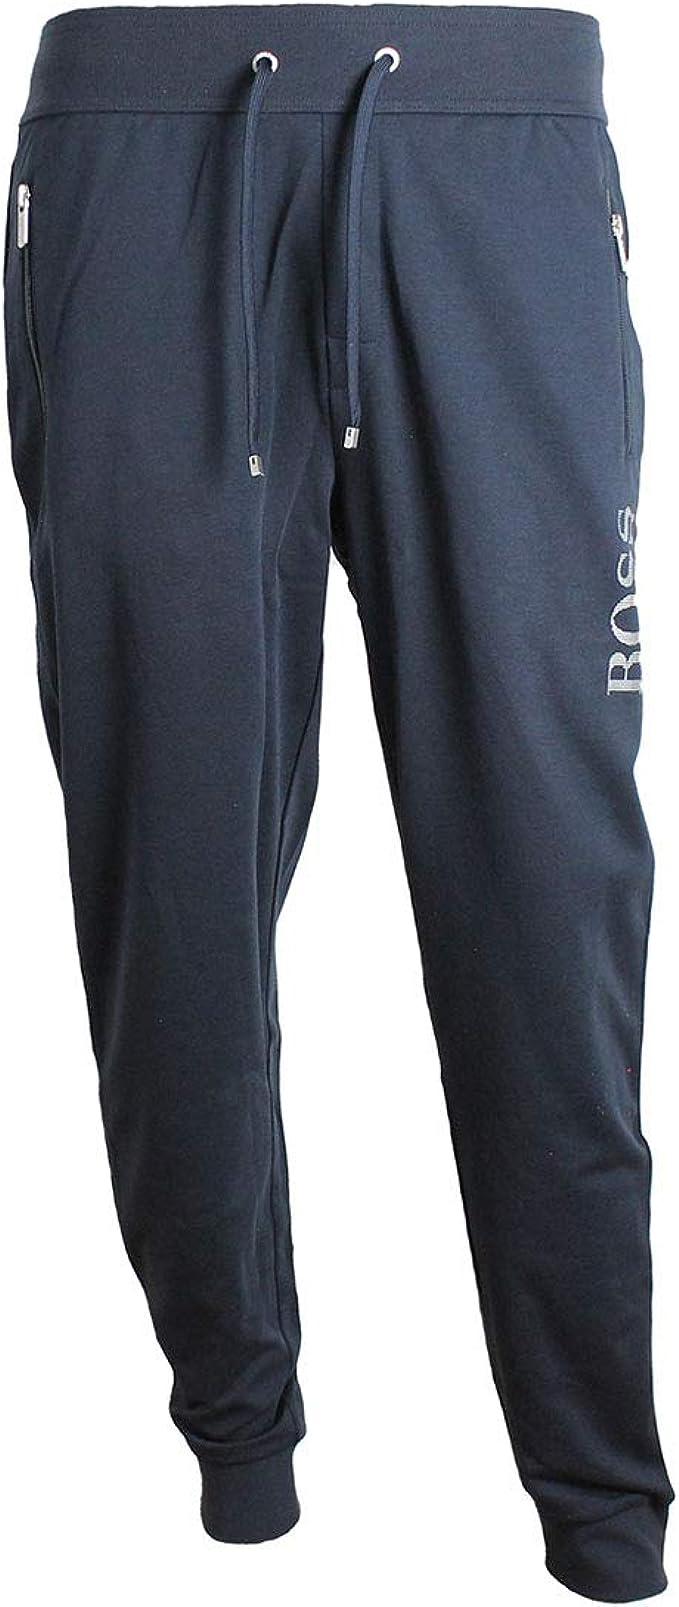 hugo boss tracksuit trousers